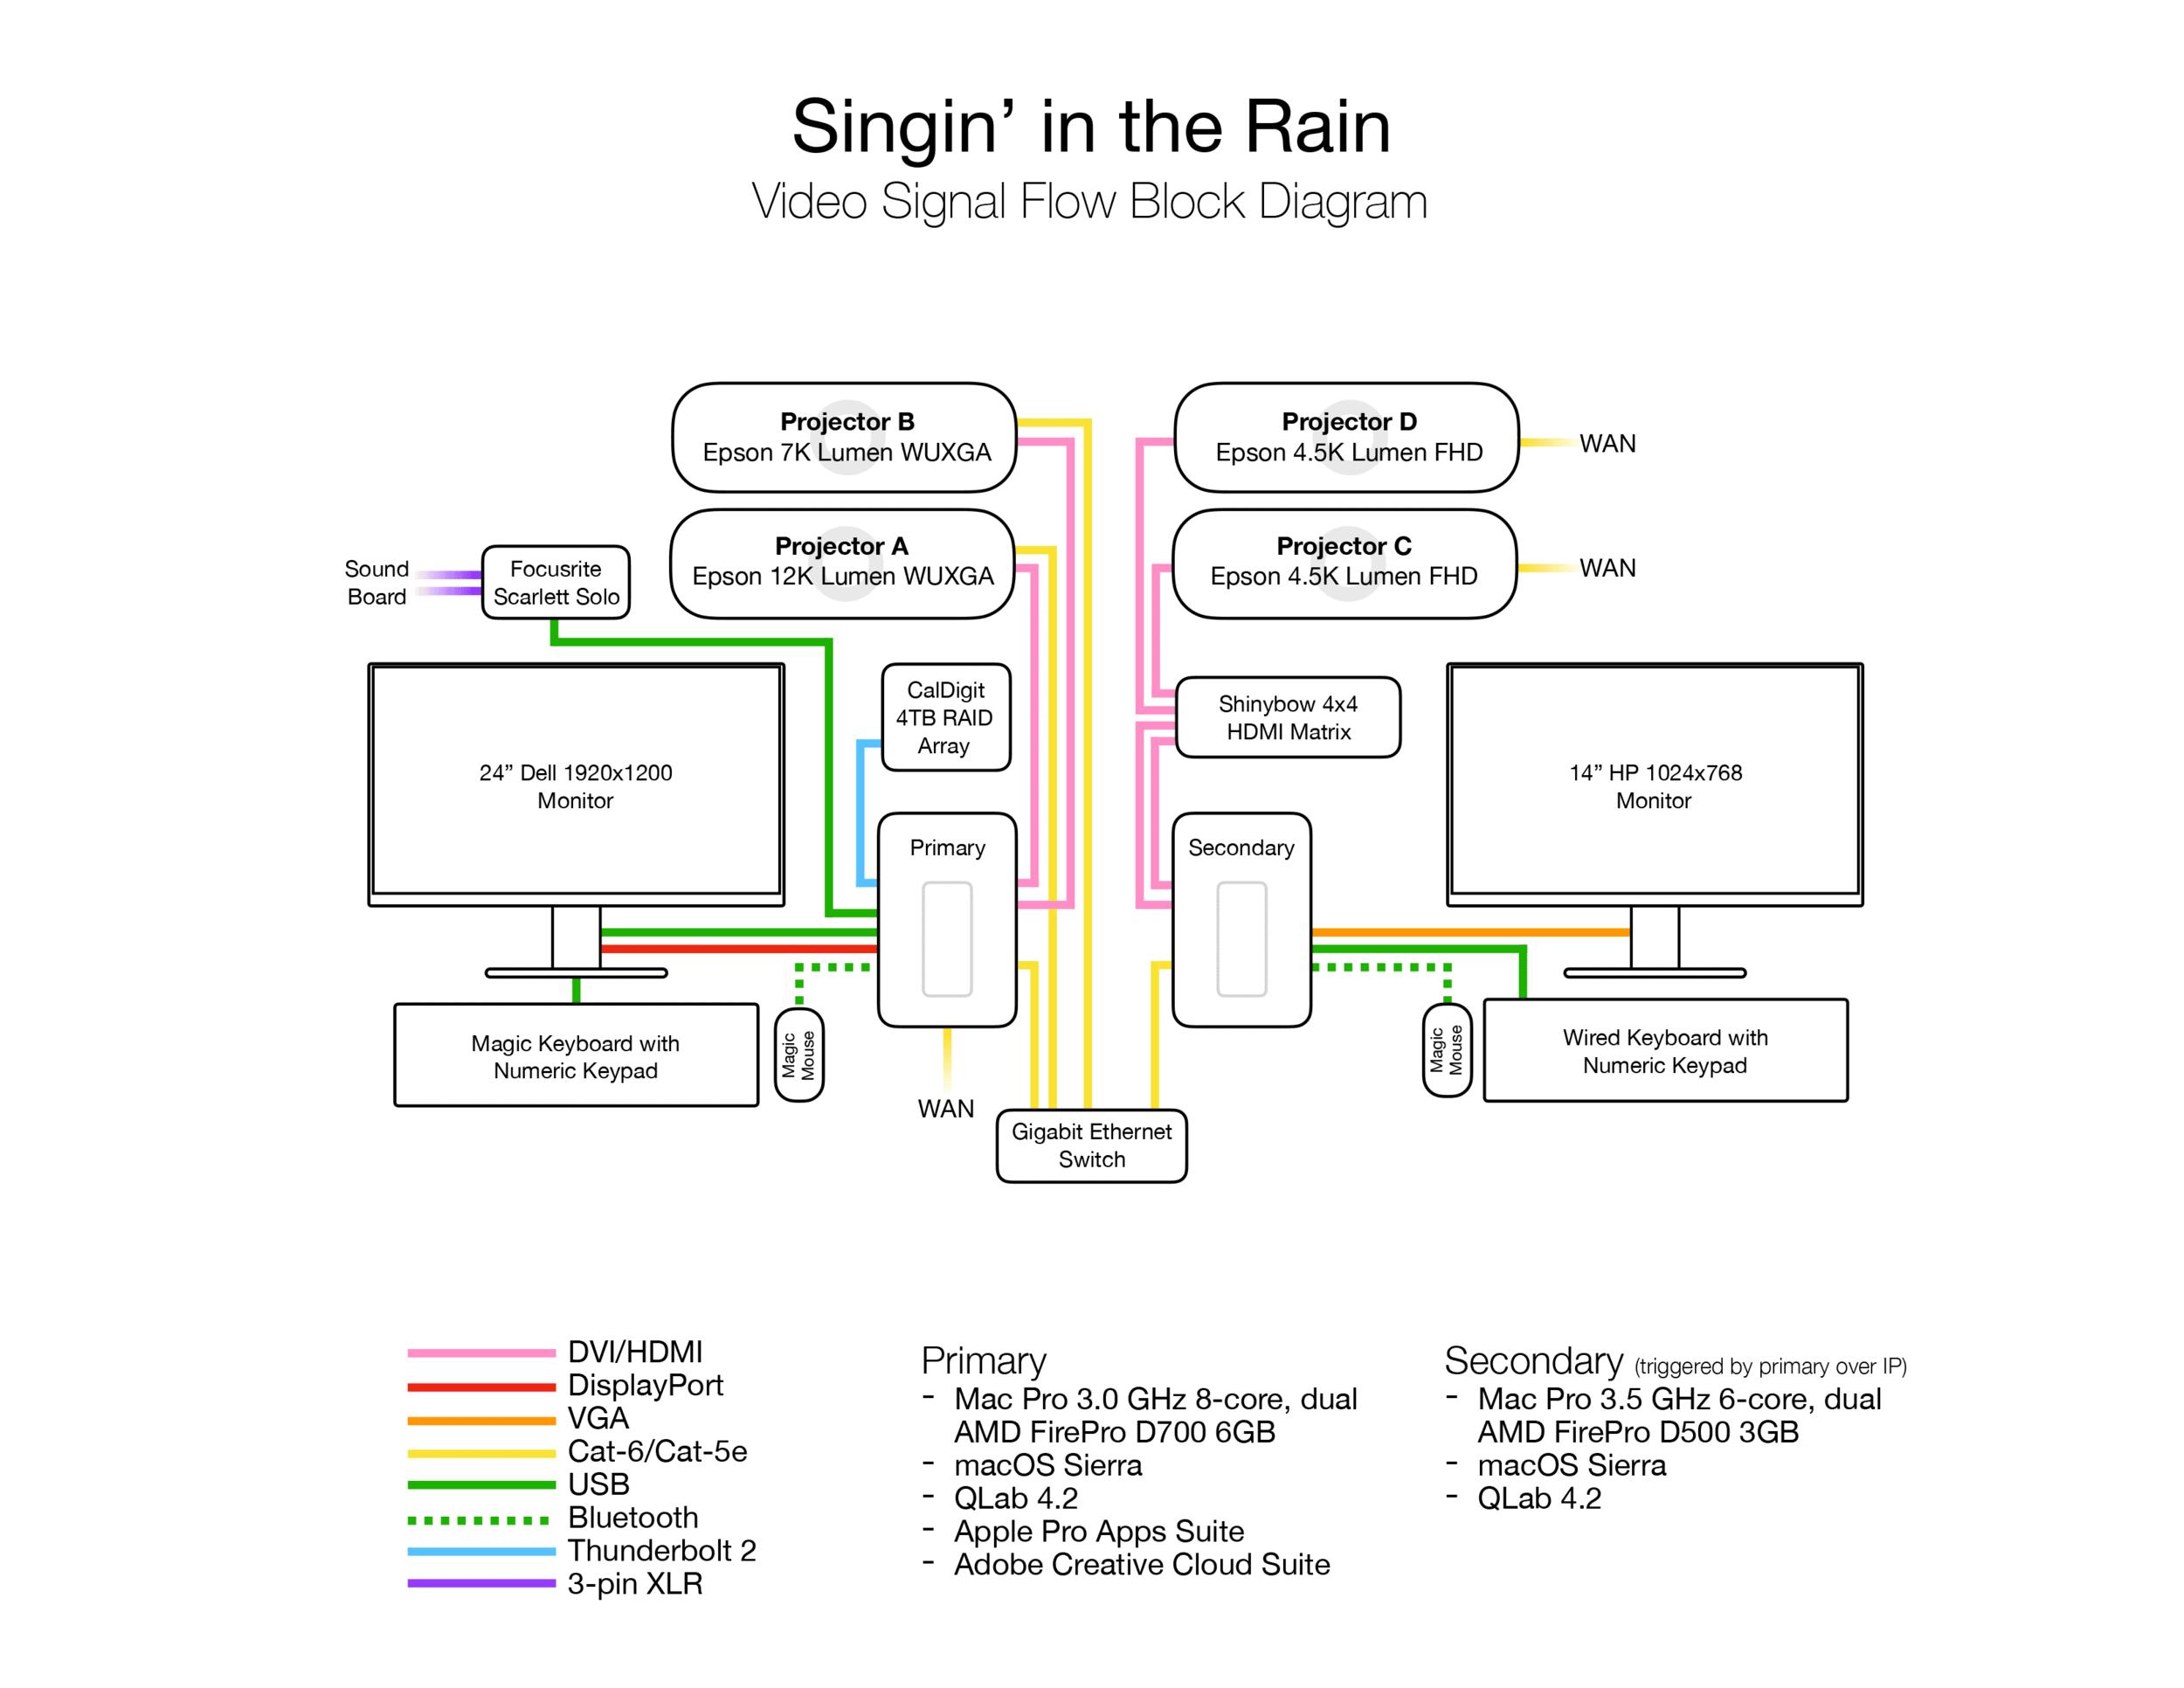 jackson-cobb-design-singin-in-the-rain-block-diagram.png